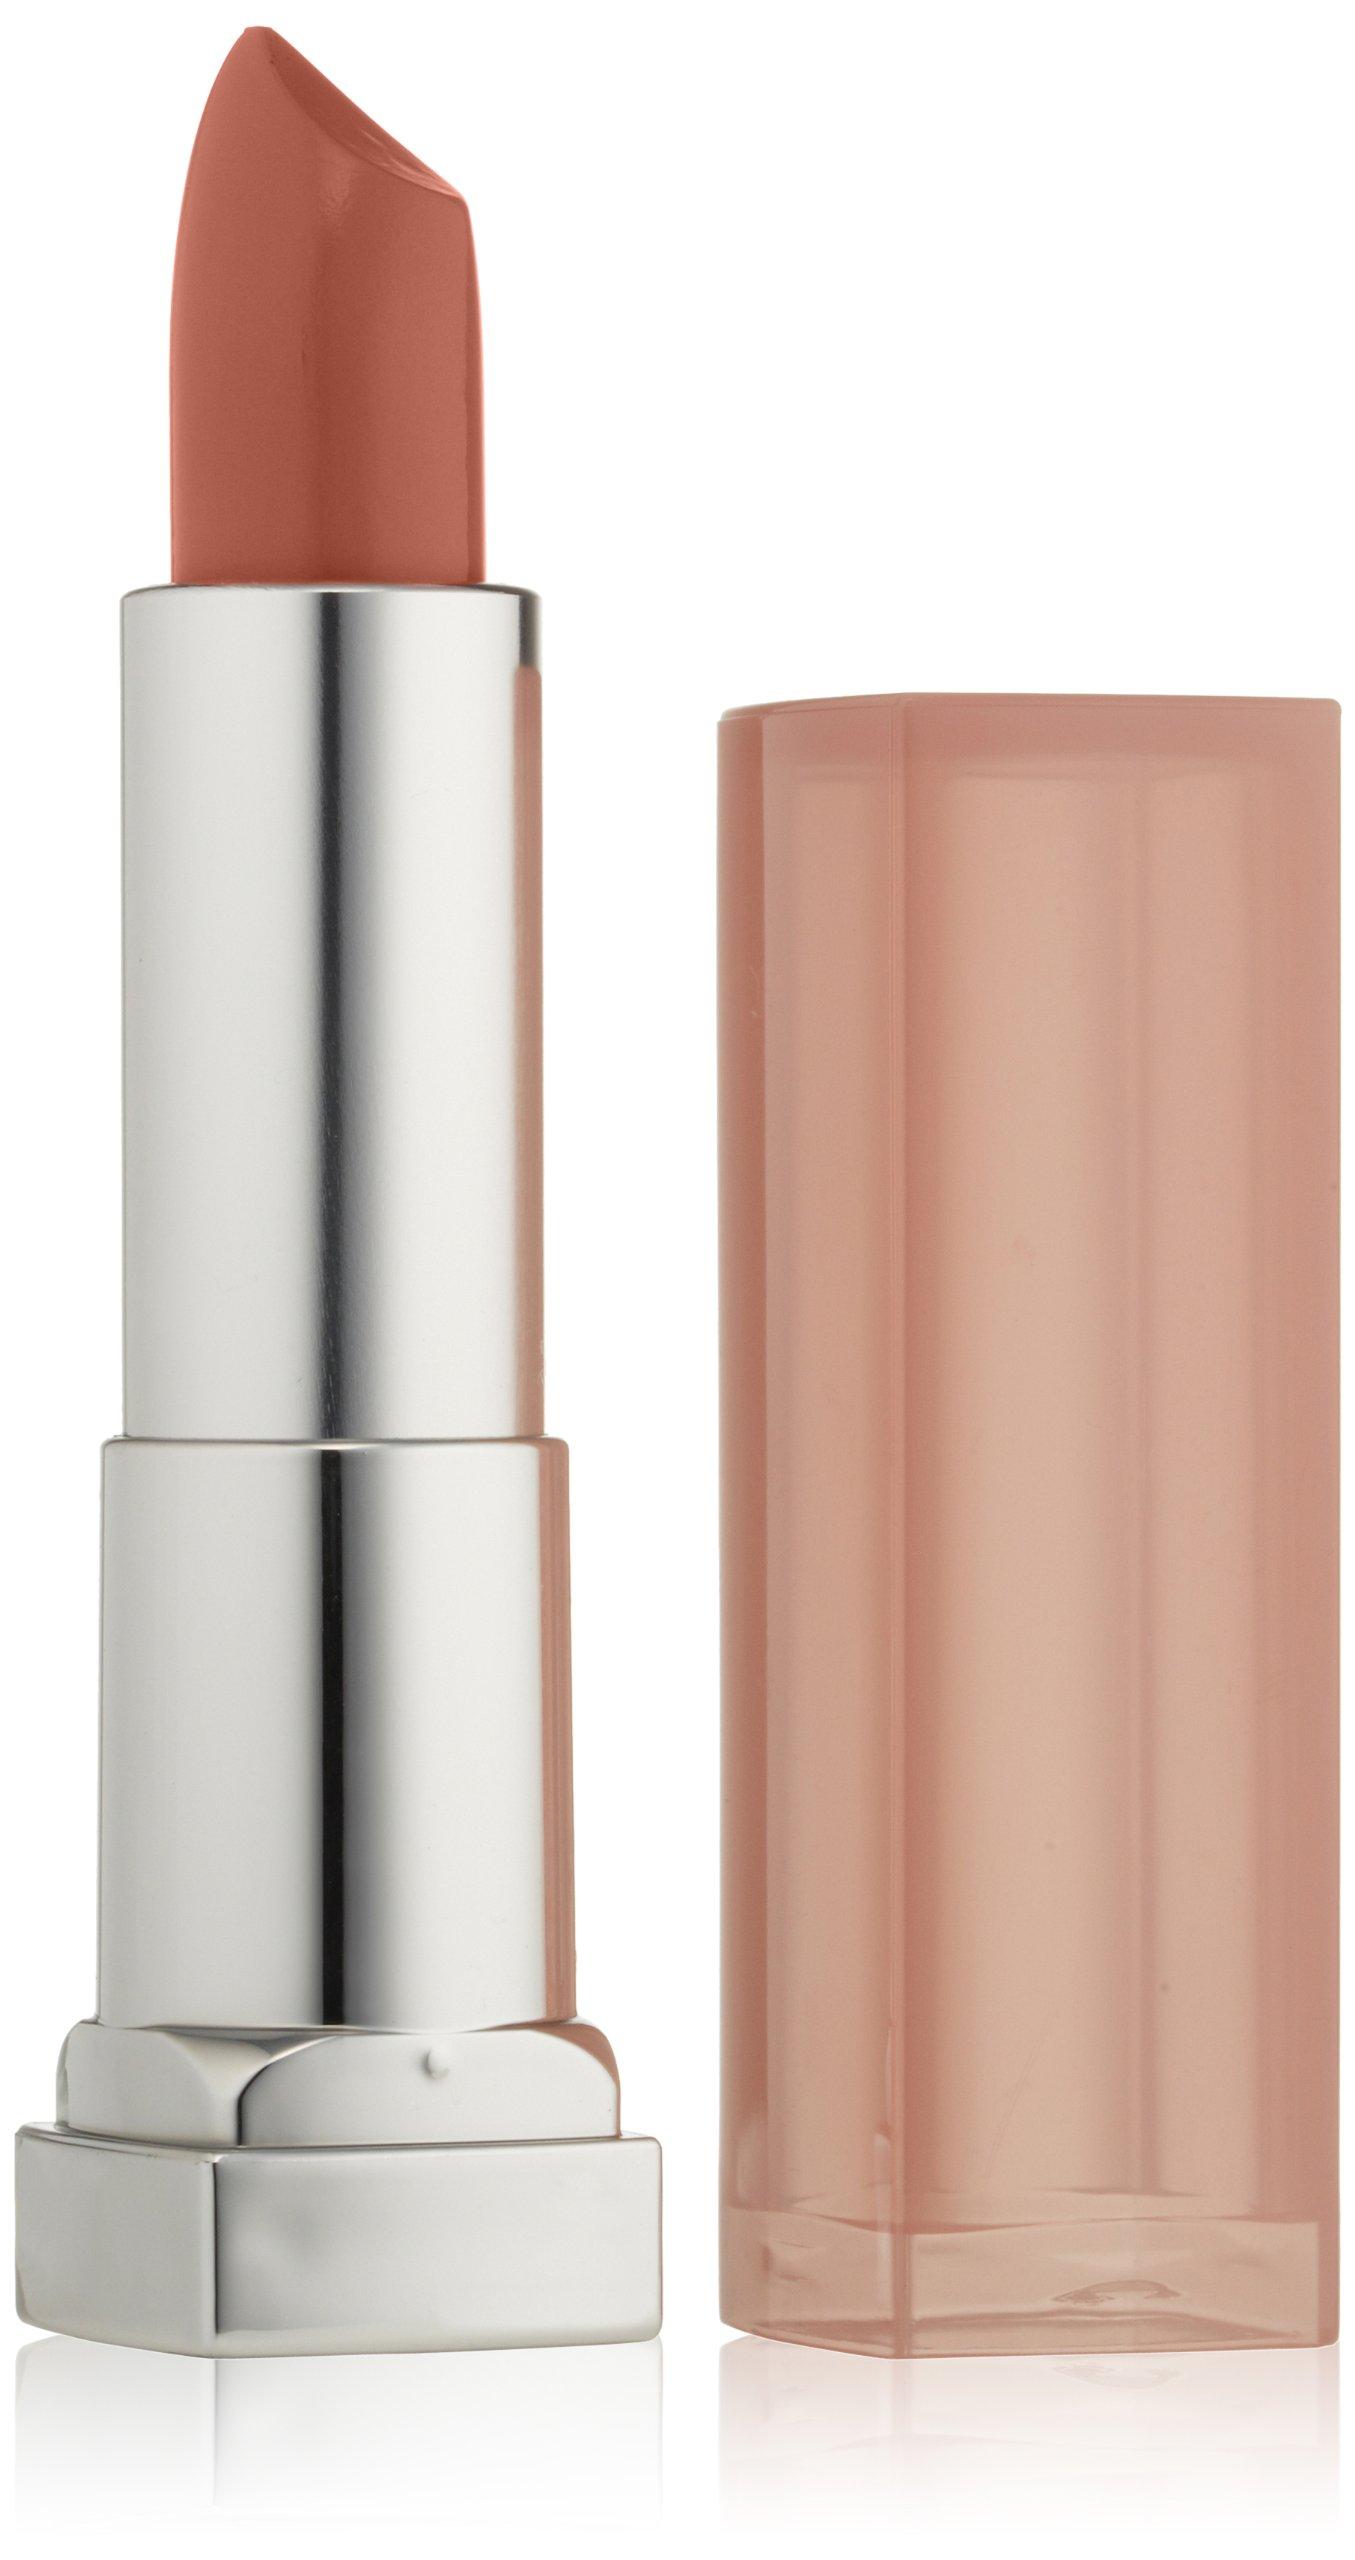 Maybelline New York Color Sensational The Buffs Lip, Stormy Sahara, 0.15 Ounce